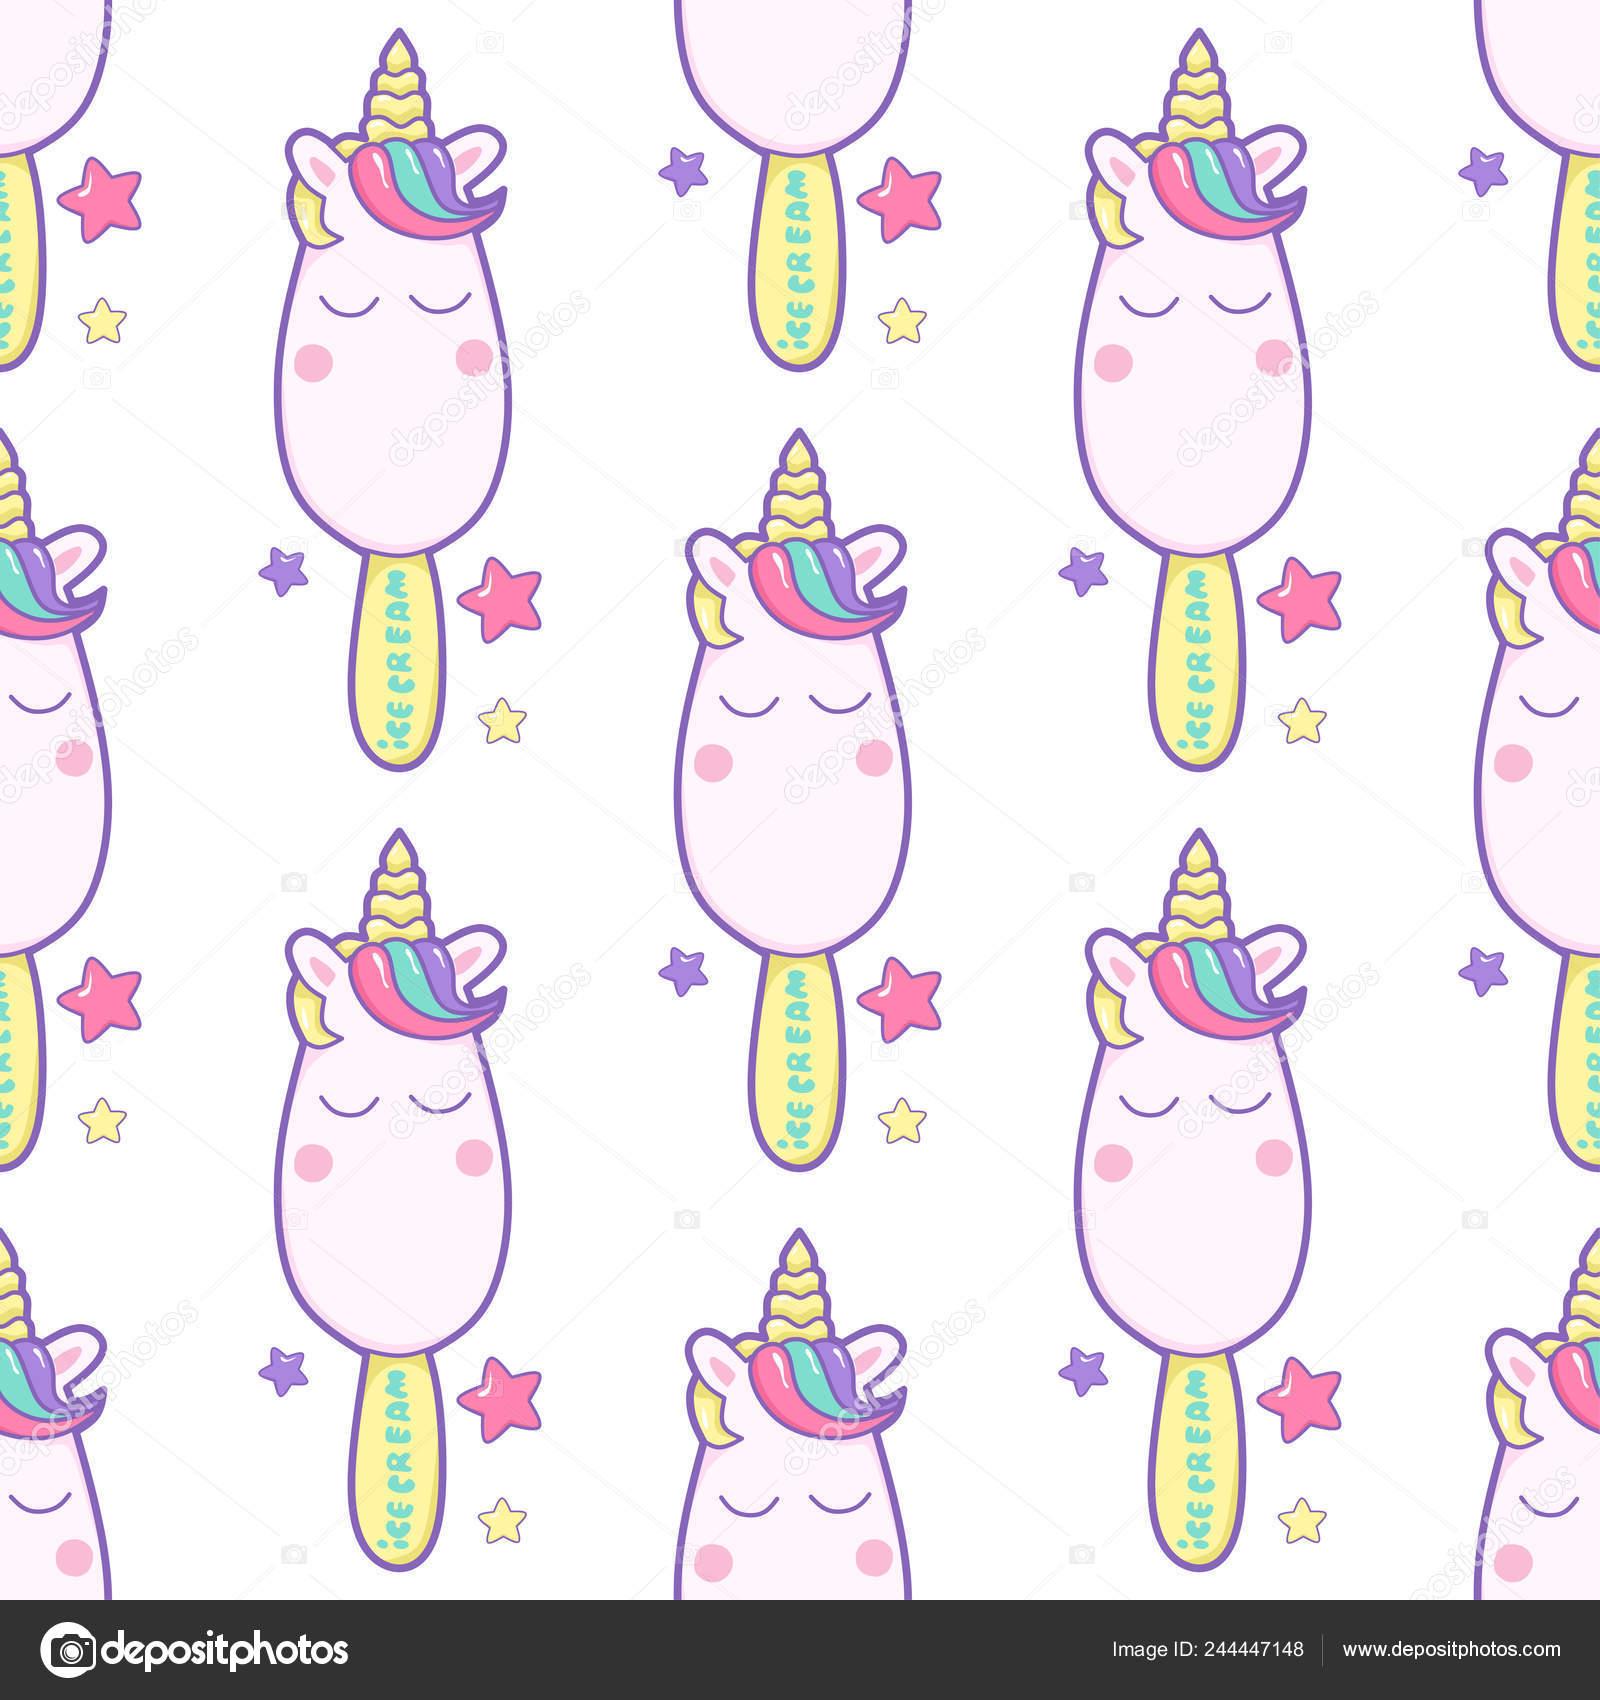 Cute Kawaii Glace Sur Licorne Bâton Rêves étoiles Modèle